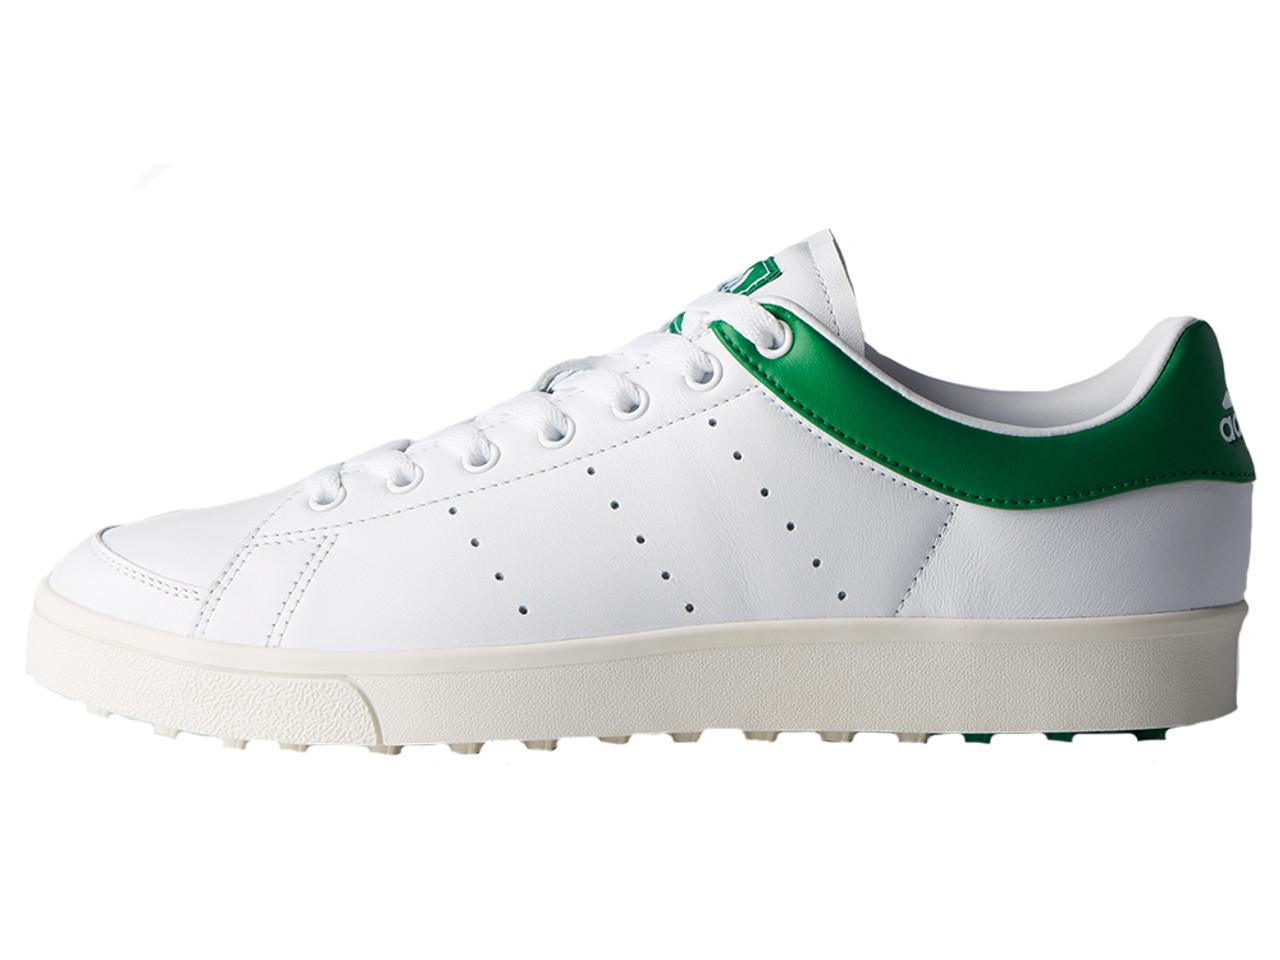 esperanza Azotado por el viento buffet  Adidas Adicross Classic Golf Shoes - FTWR White/Green - Mens | GolfBox